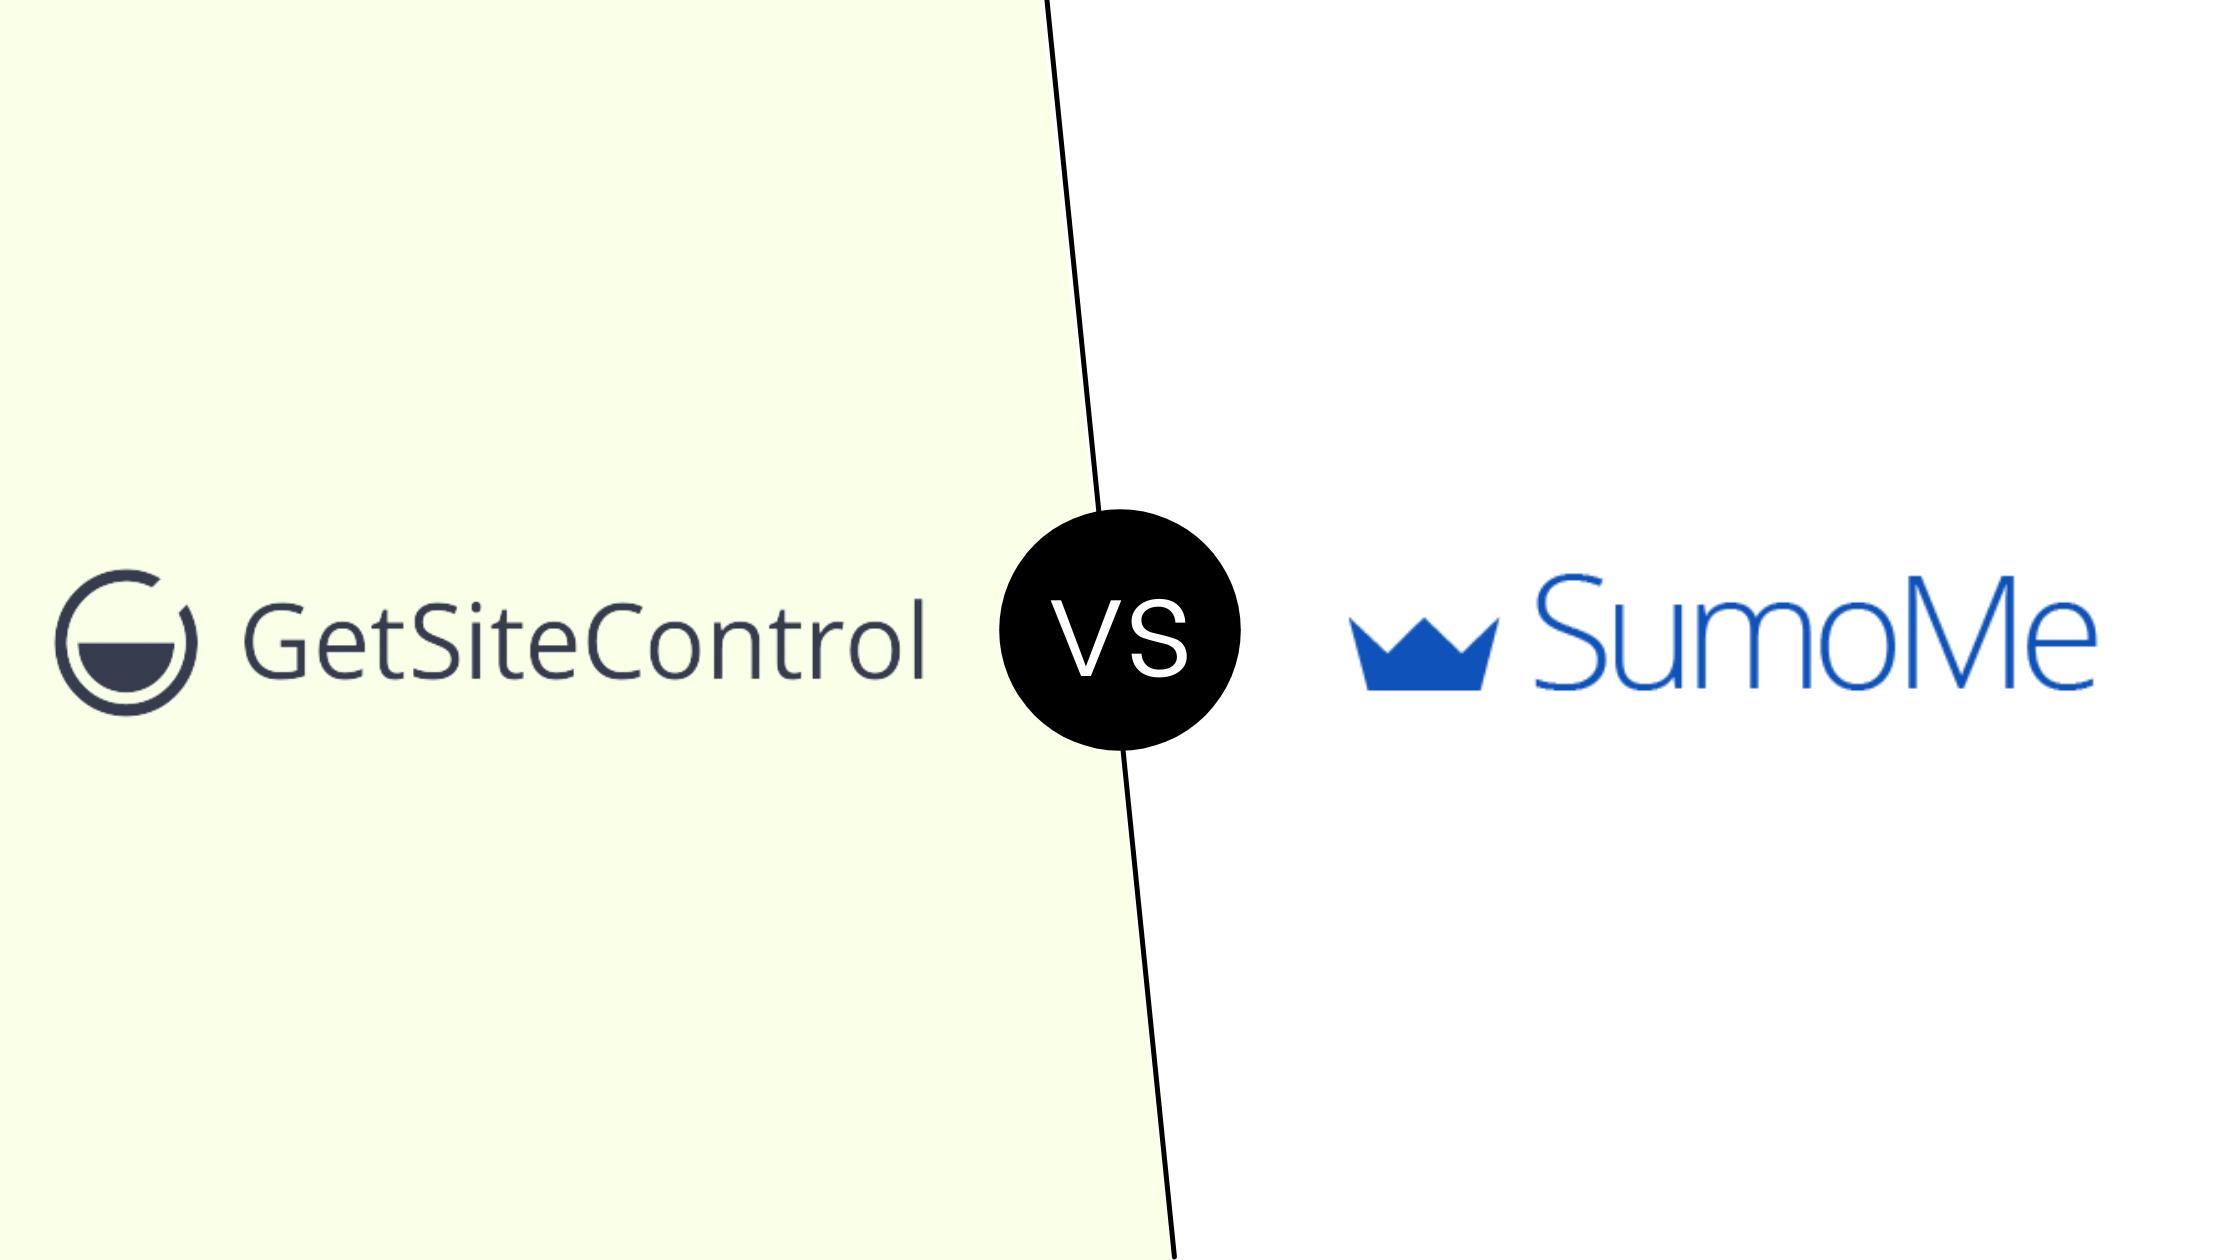 Getsitecontrol vs SumoMe